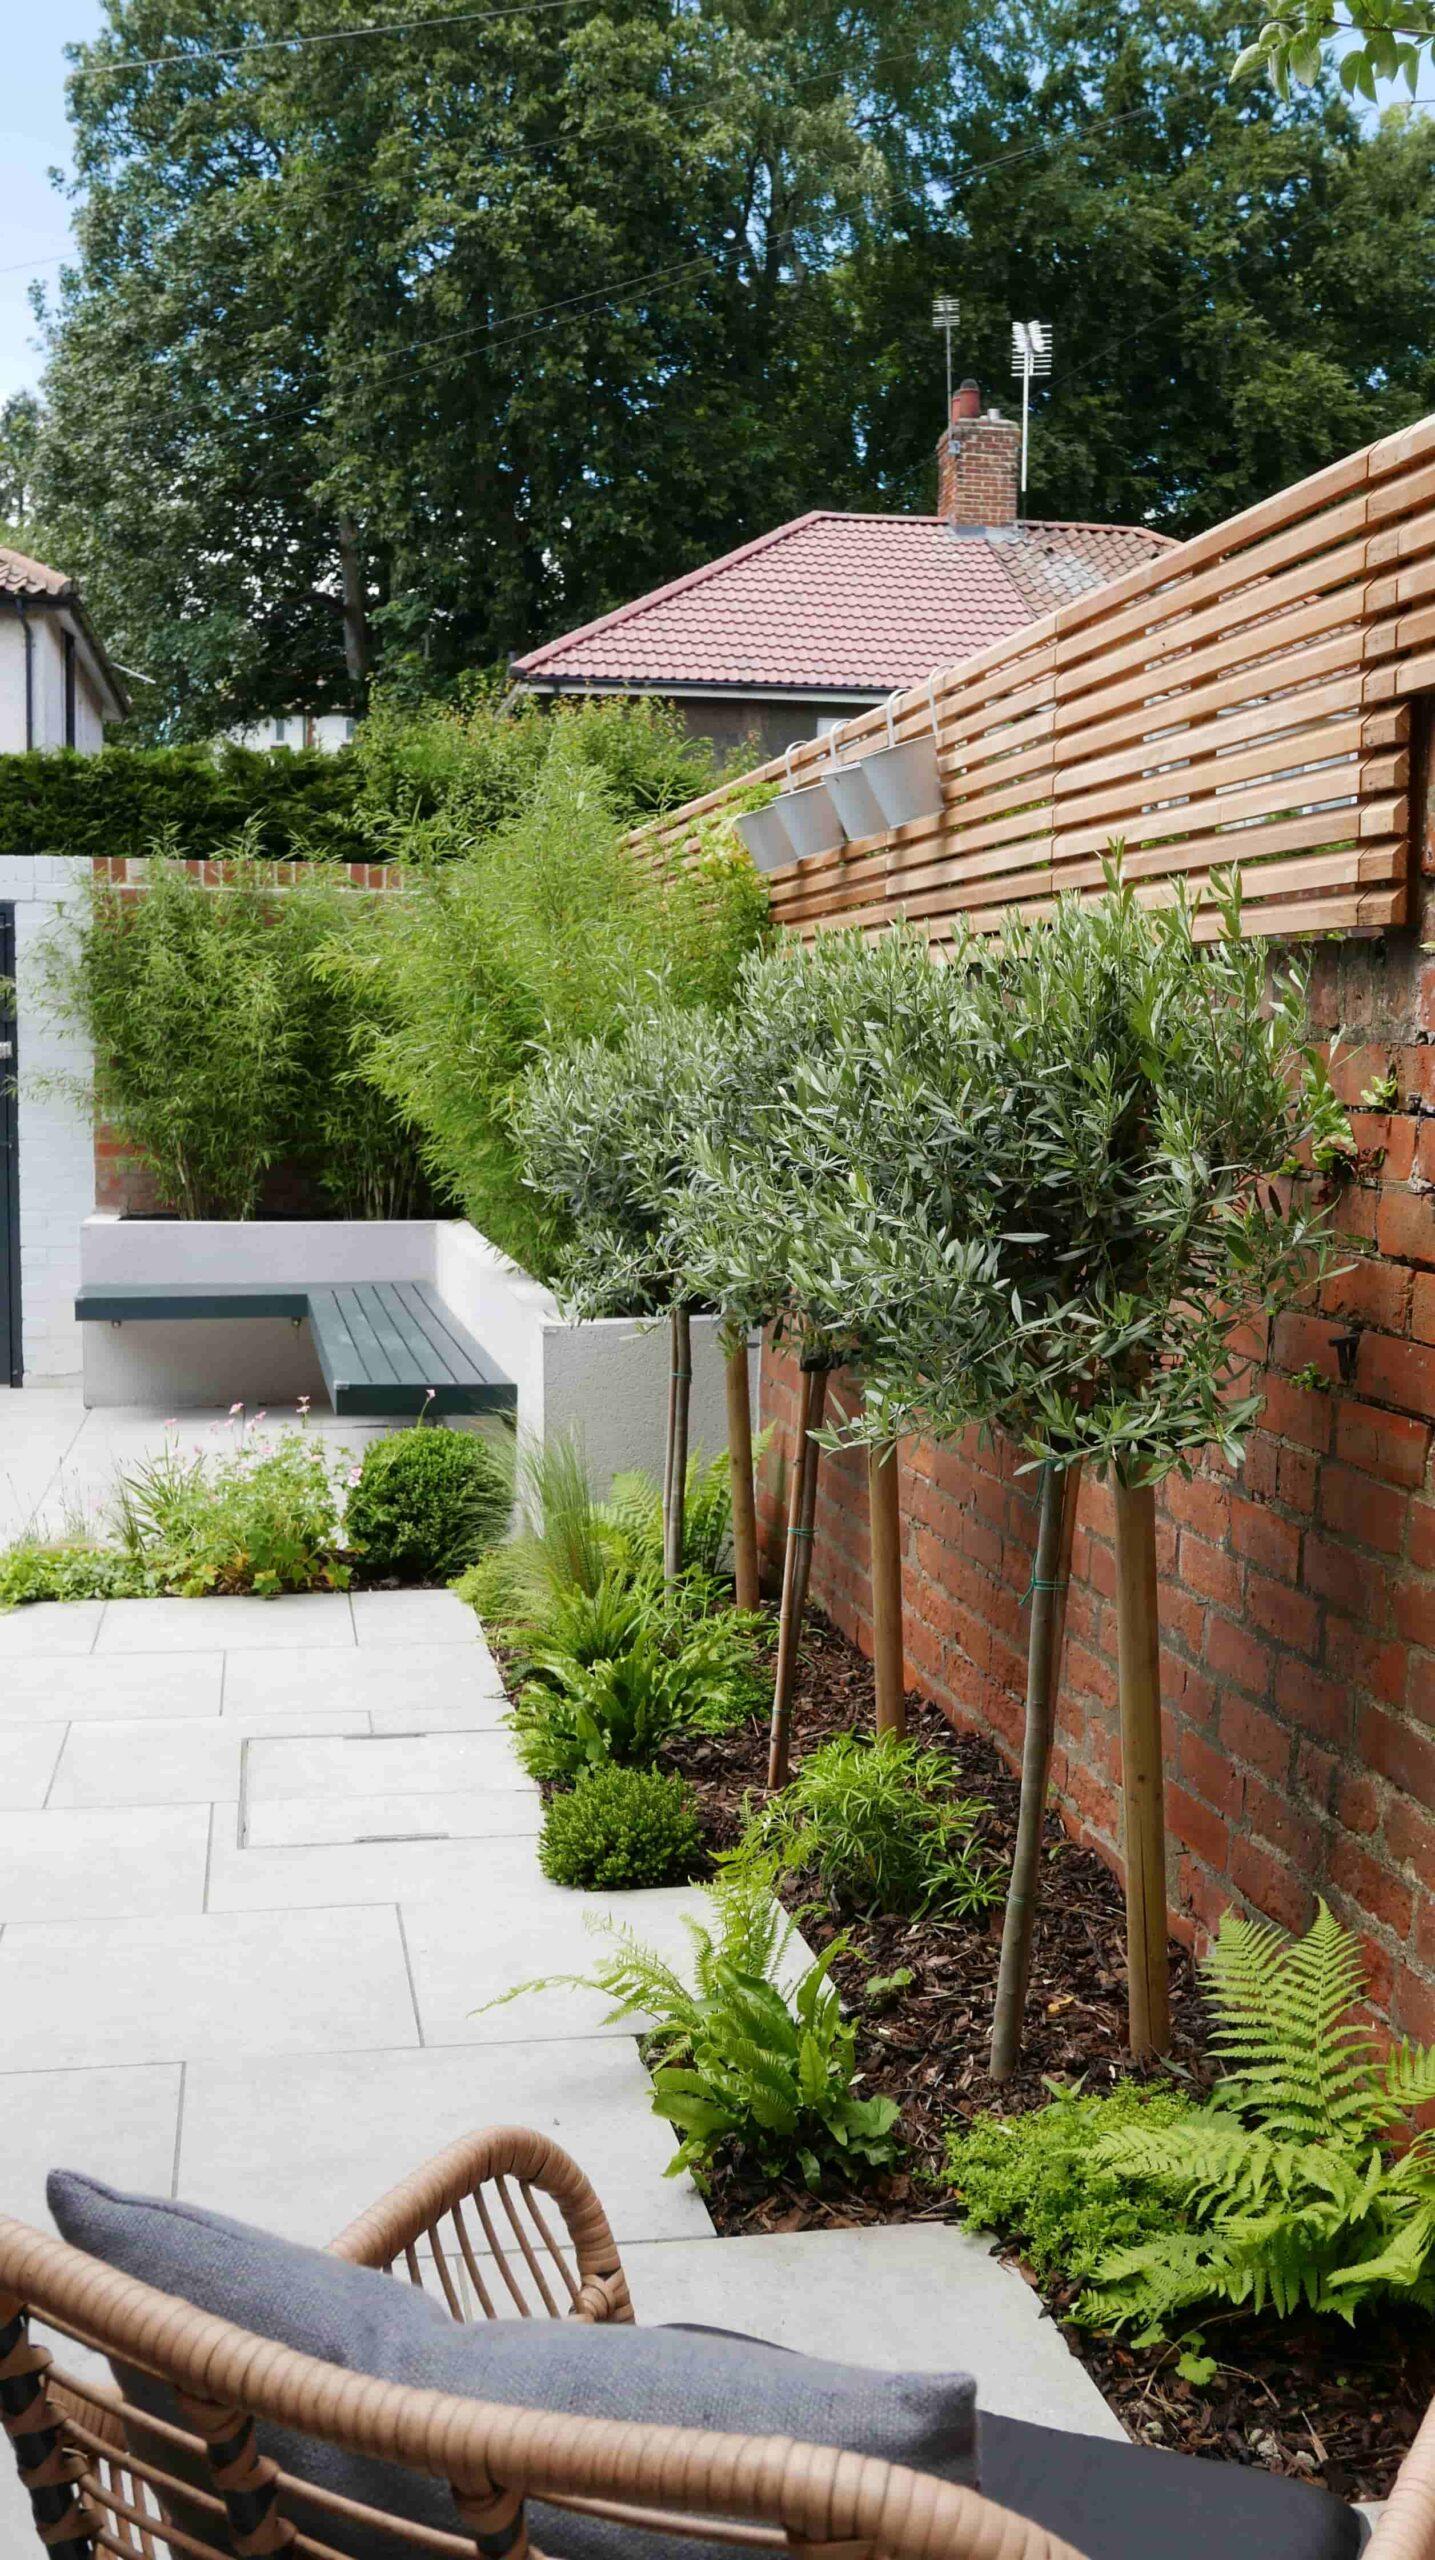 sam-nattress-projects-landscape-design-darlington-courtyard-garden-design